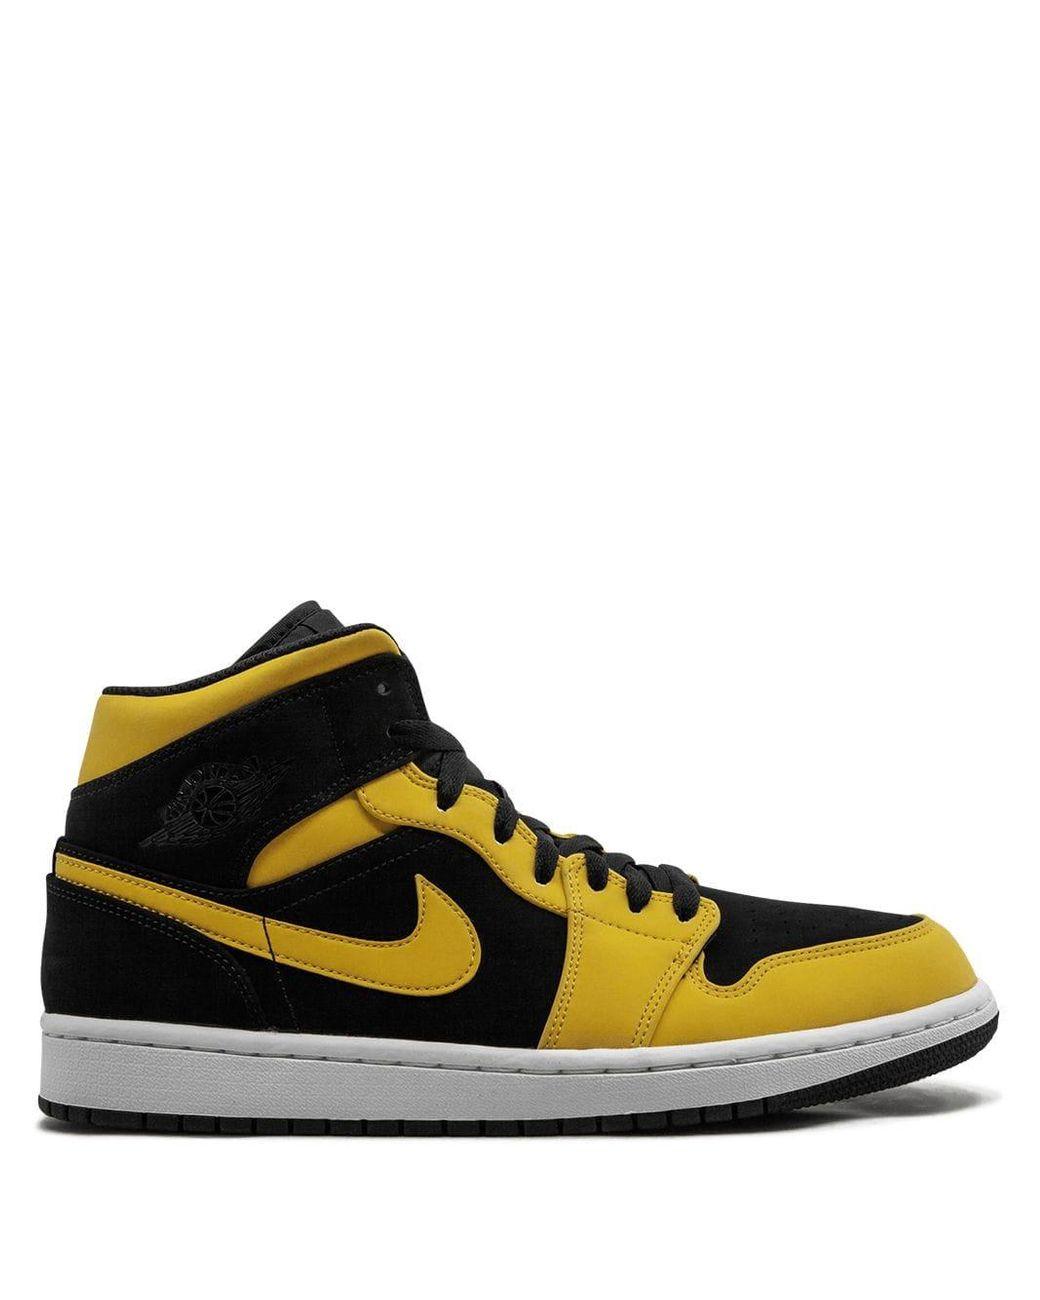 TD Reverse New Love Size 10c Black // University Gold White Jordan 1 Mid